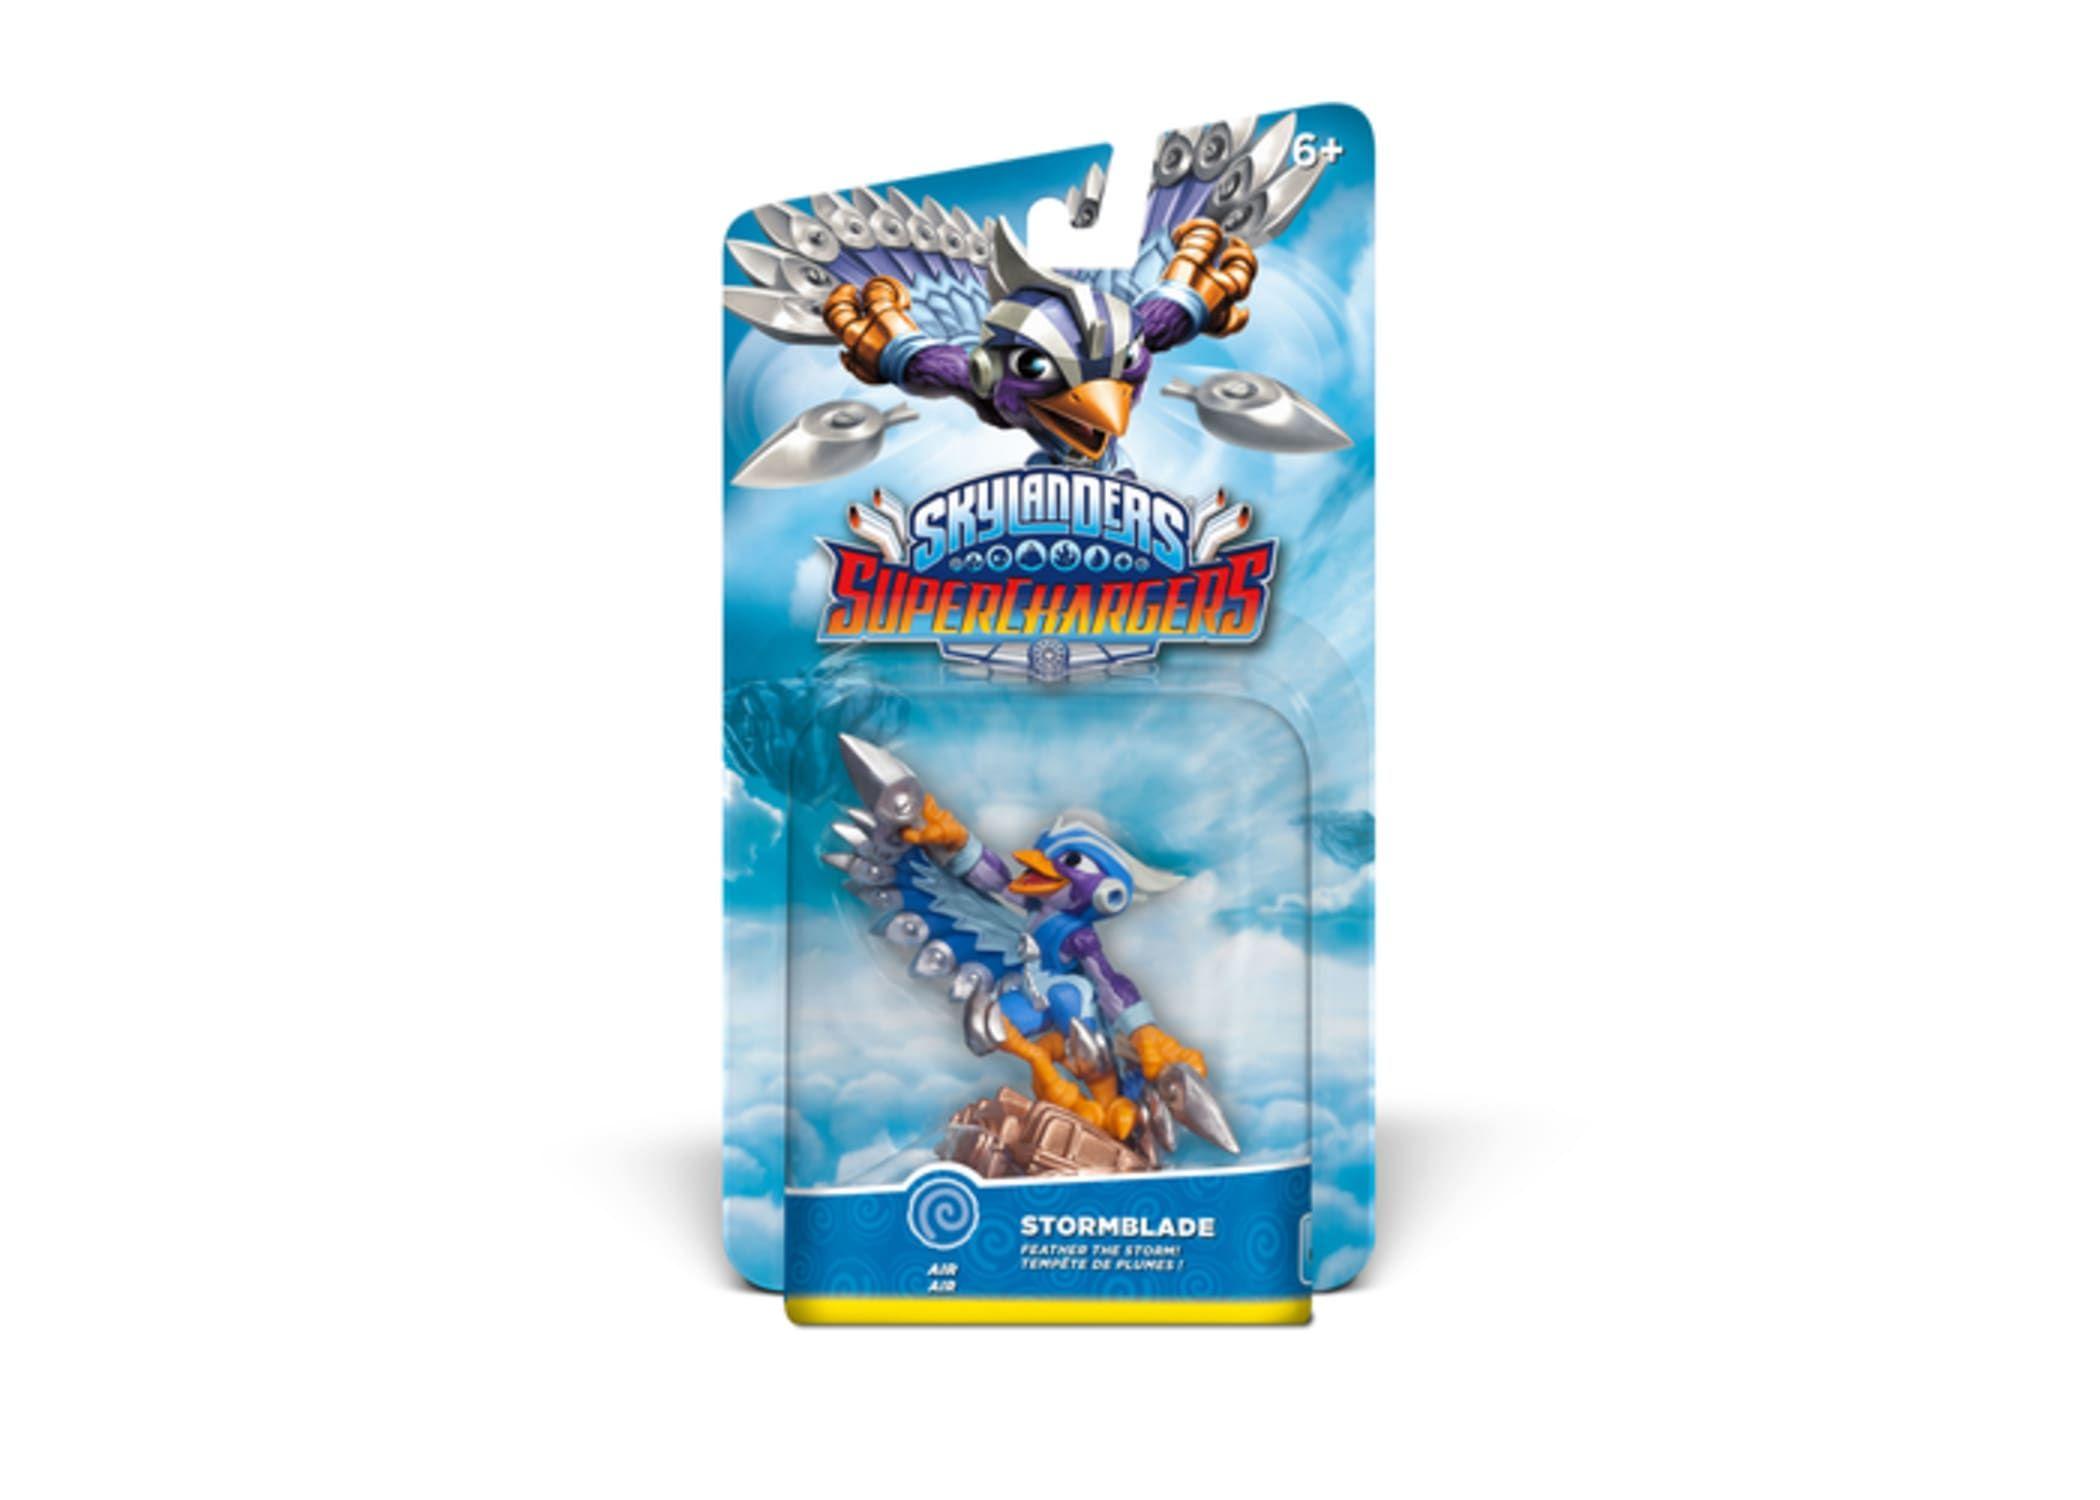 Buy Stormblade - Skylanders SuperChargers Character  GAME #Affiliate , #Ad, #Skylanders, #Stormblade, #Buy, #GAME, #Character